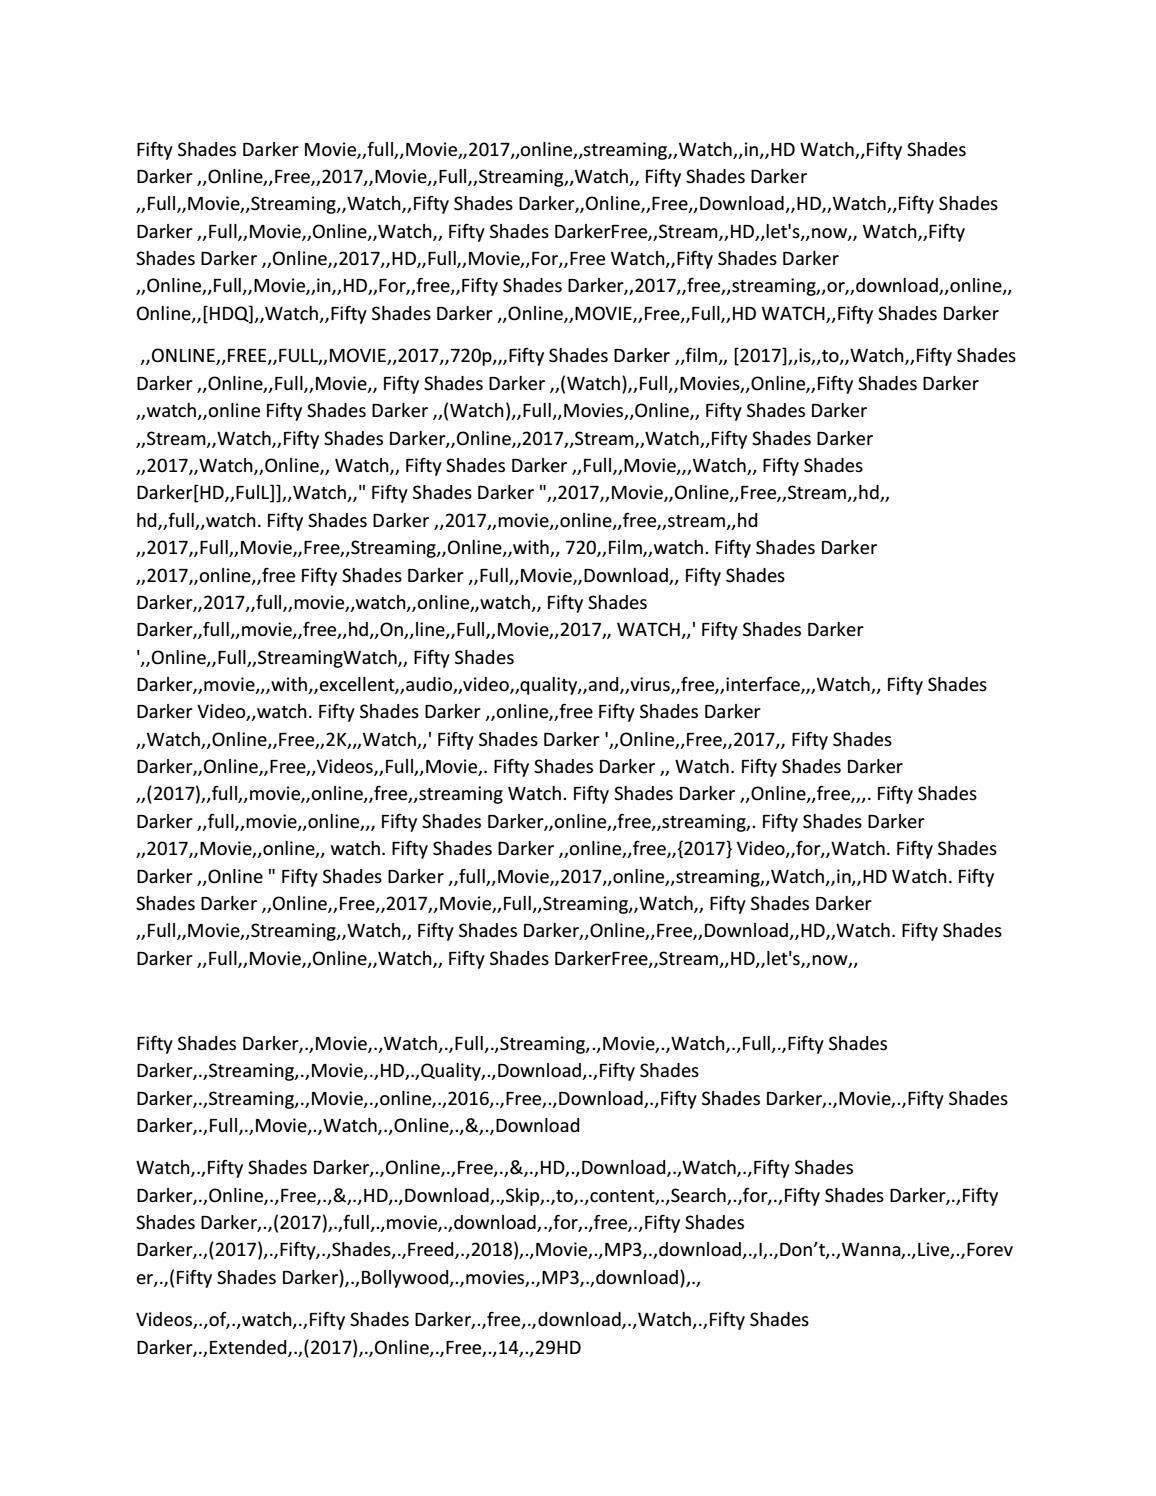 Fifty shades darker pdf epub mobi free download by el james.